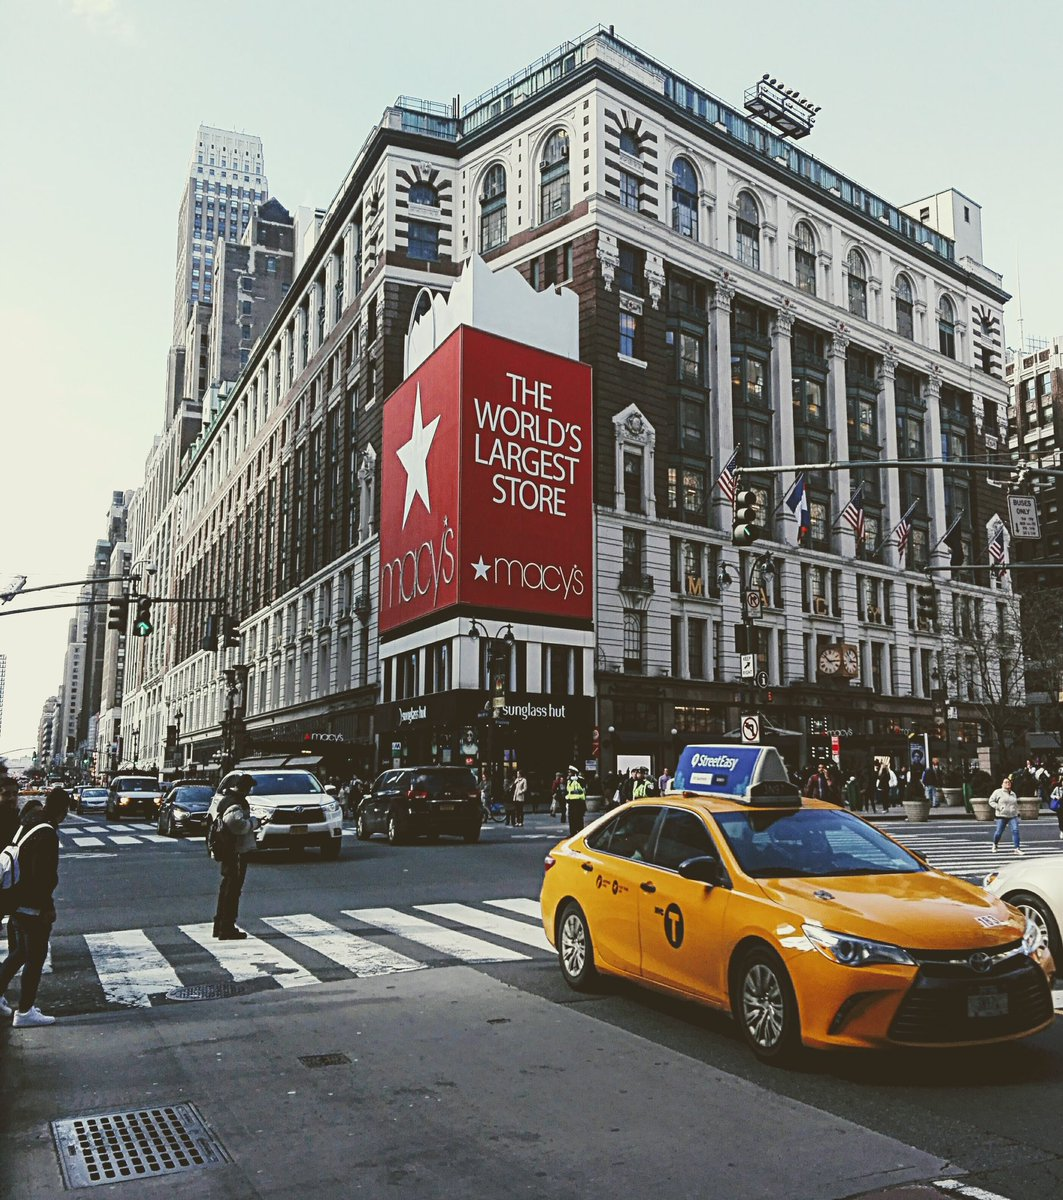 NYC @Macys  @nycgov  @NewYorker  • • #travel #travelphotography #macysthanksgivingparade #macys #shopping #taxi #NewYorkCity #NewYearsResolution #tapairportugal #world #pictures